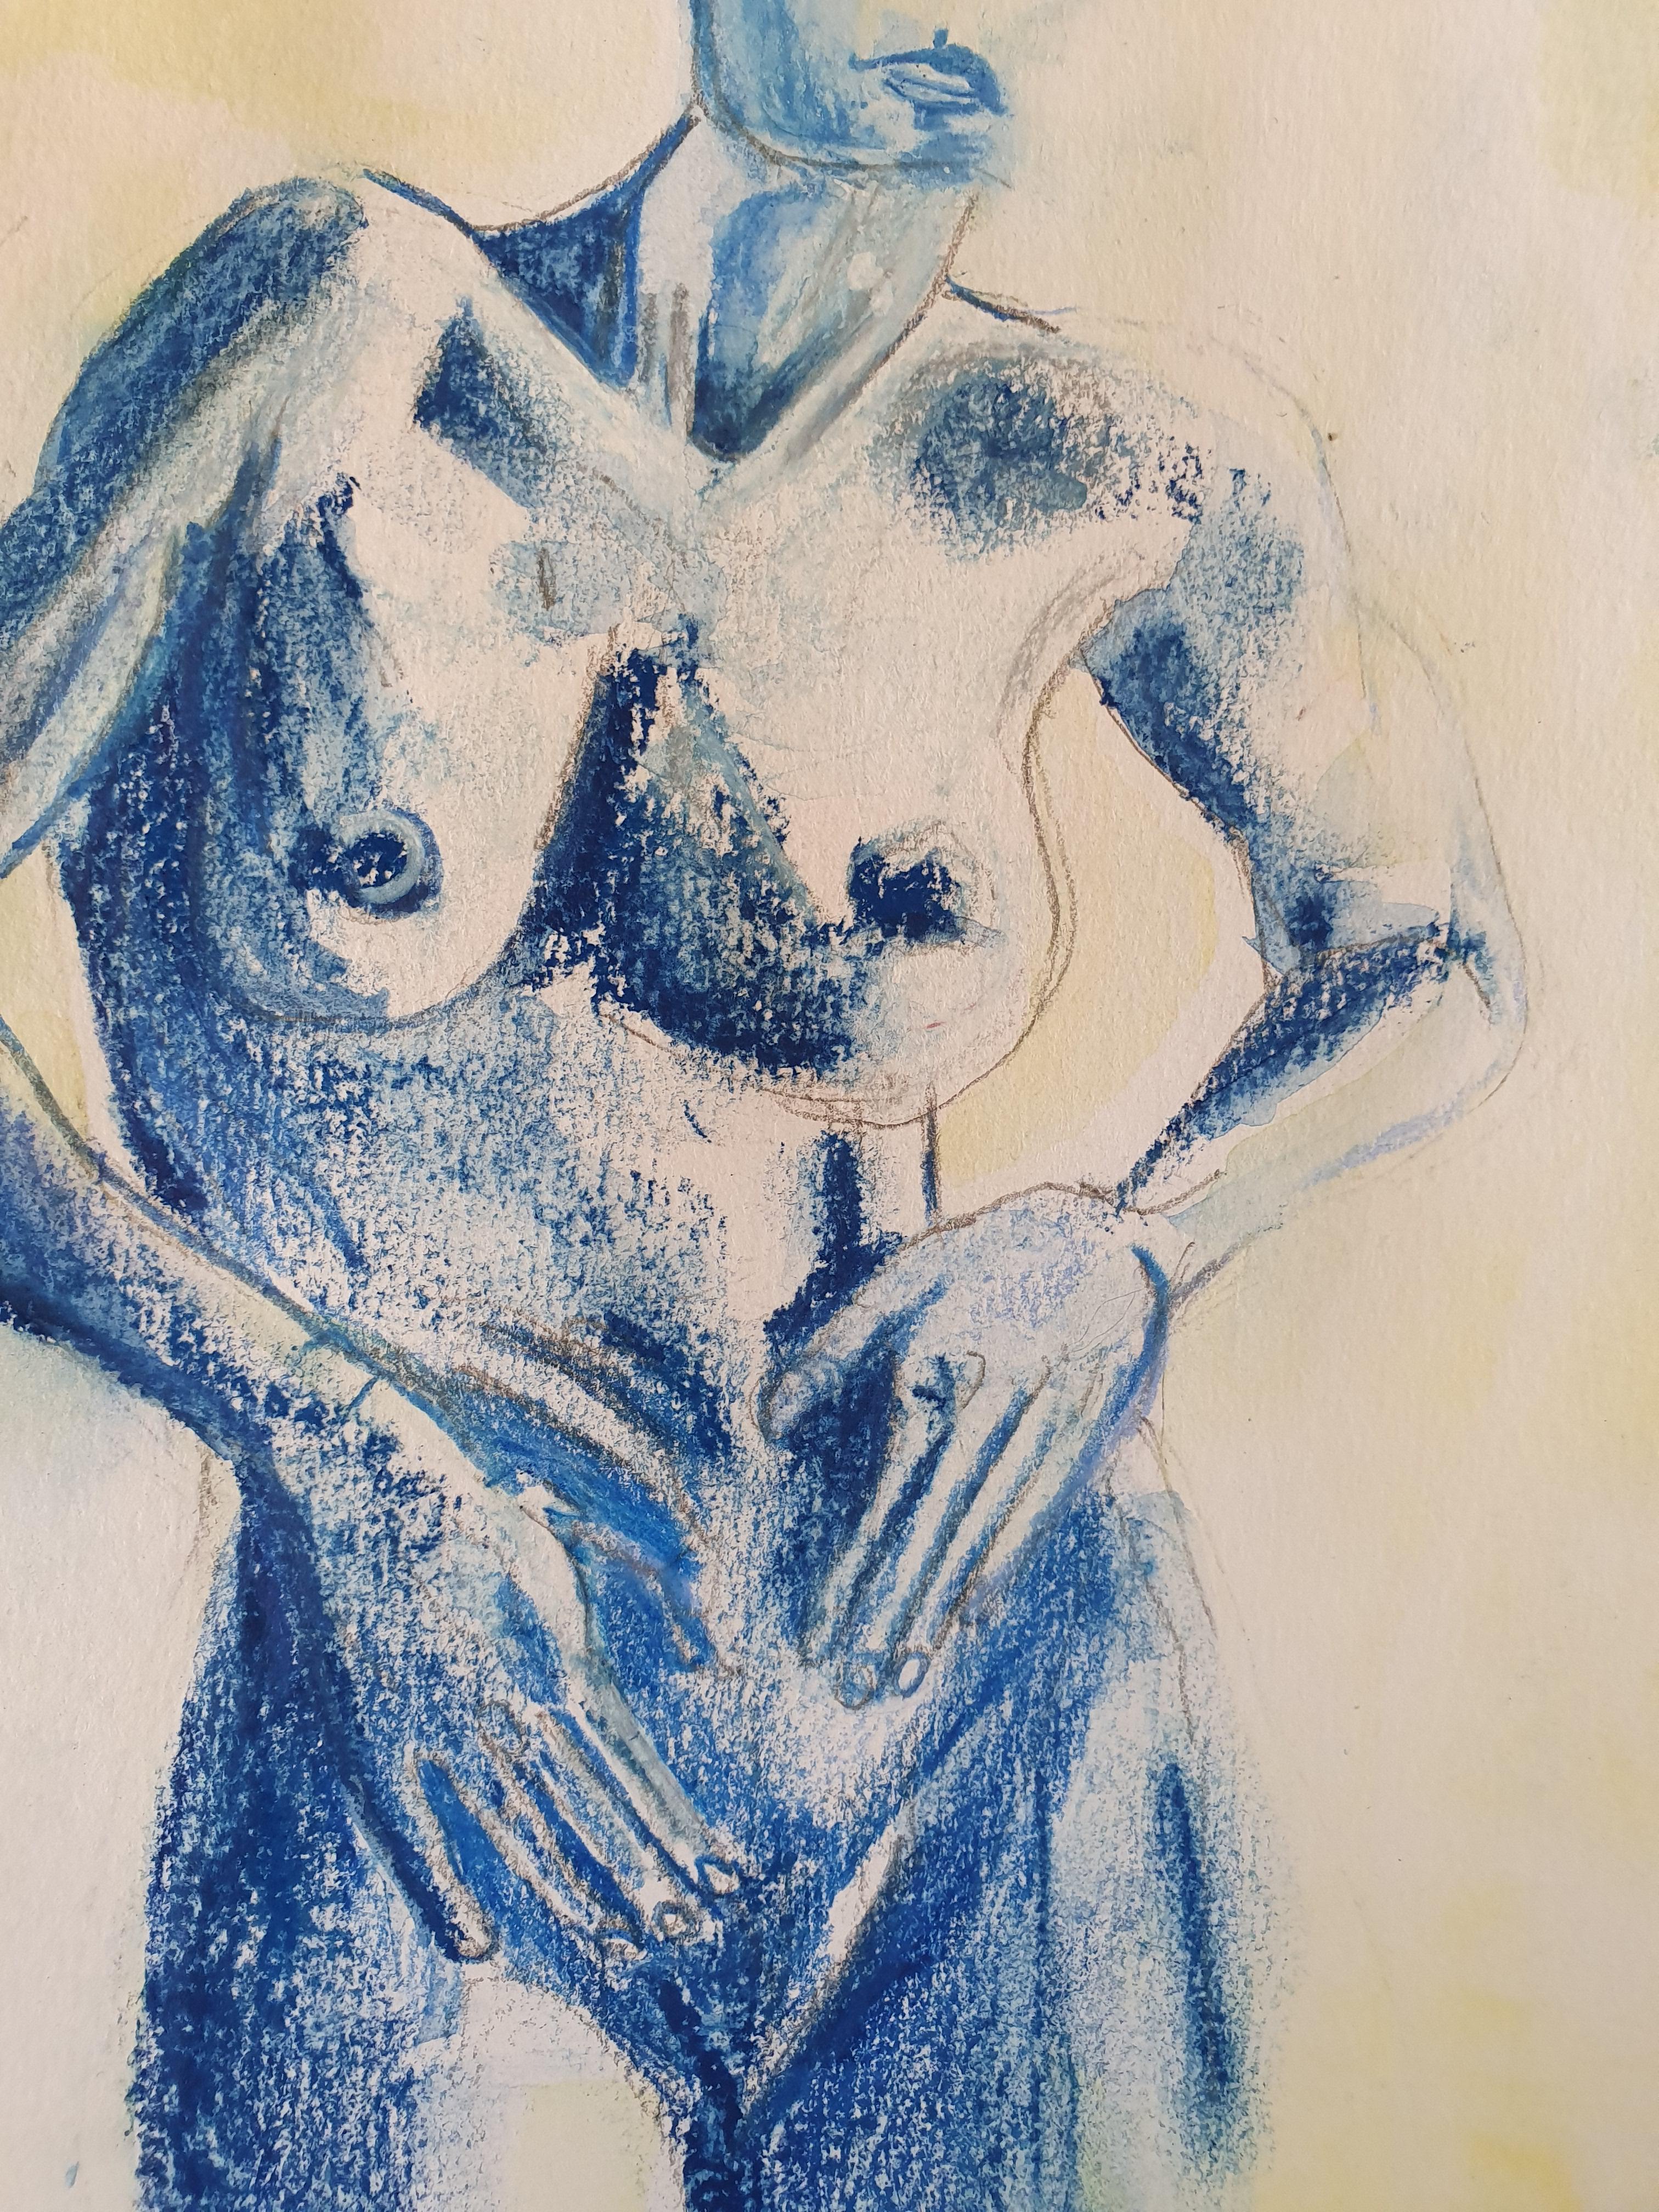 Dessin pastel aquarelle bleu torse face  cours de dessin